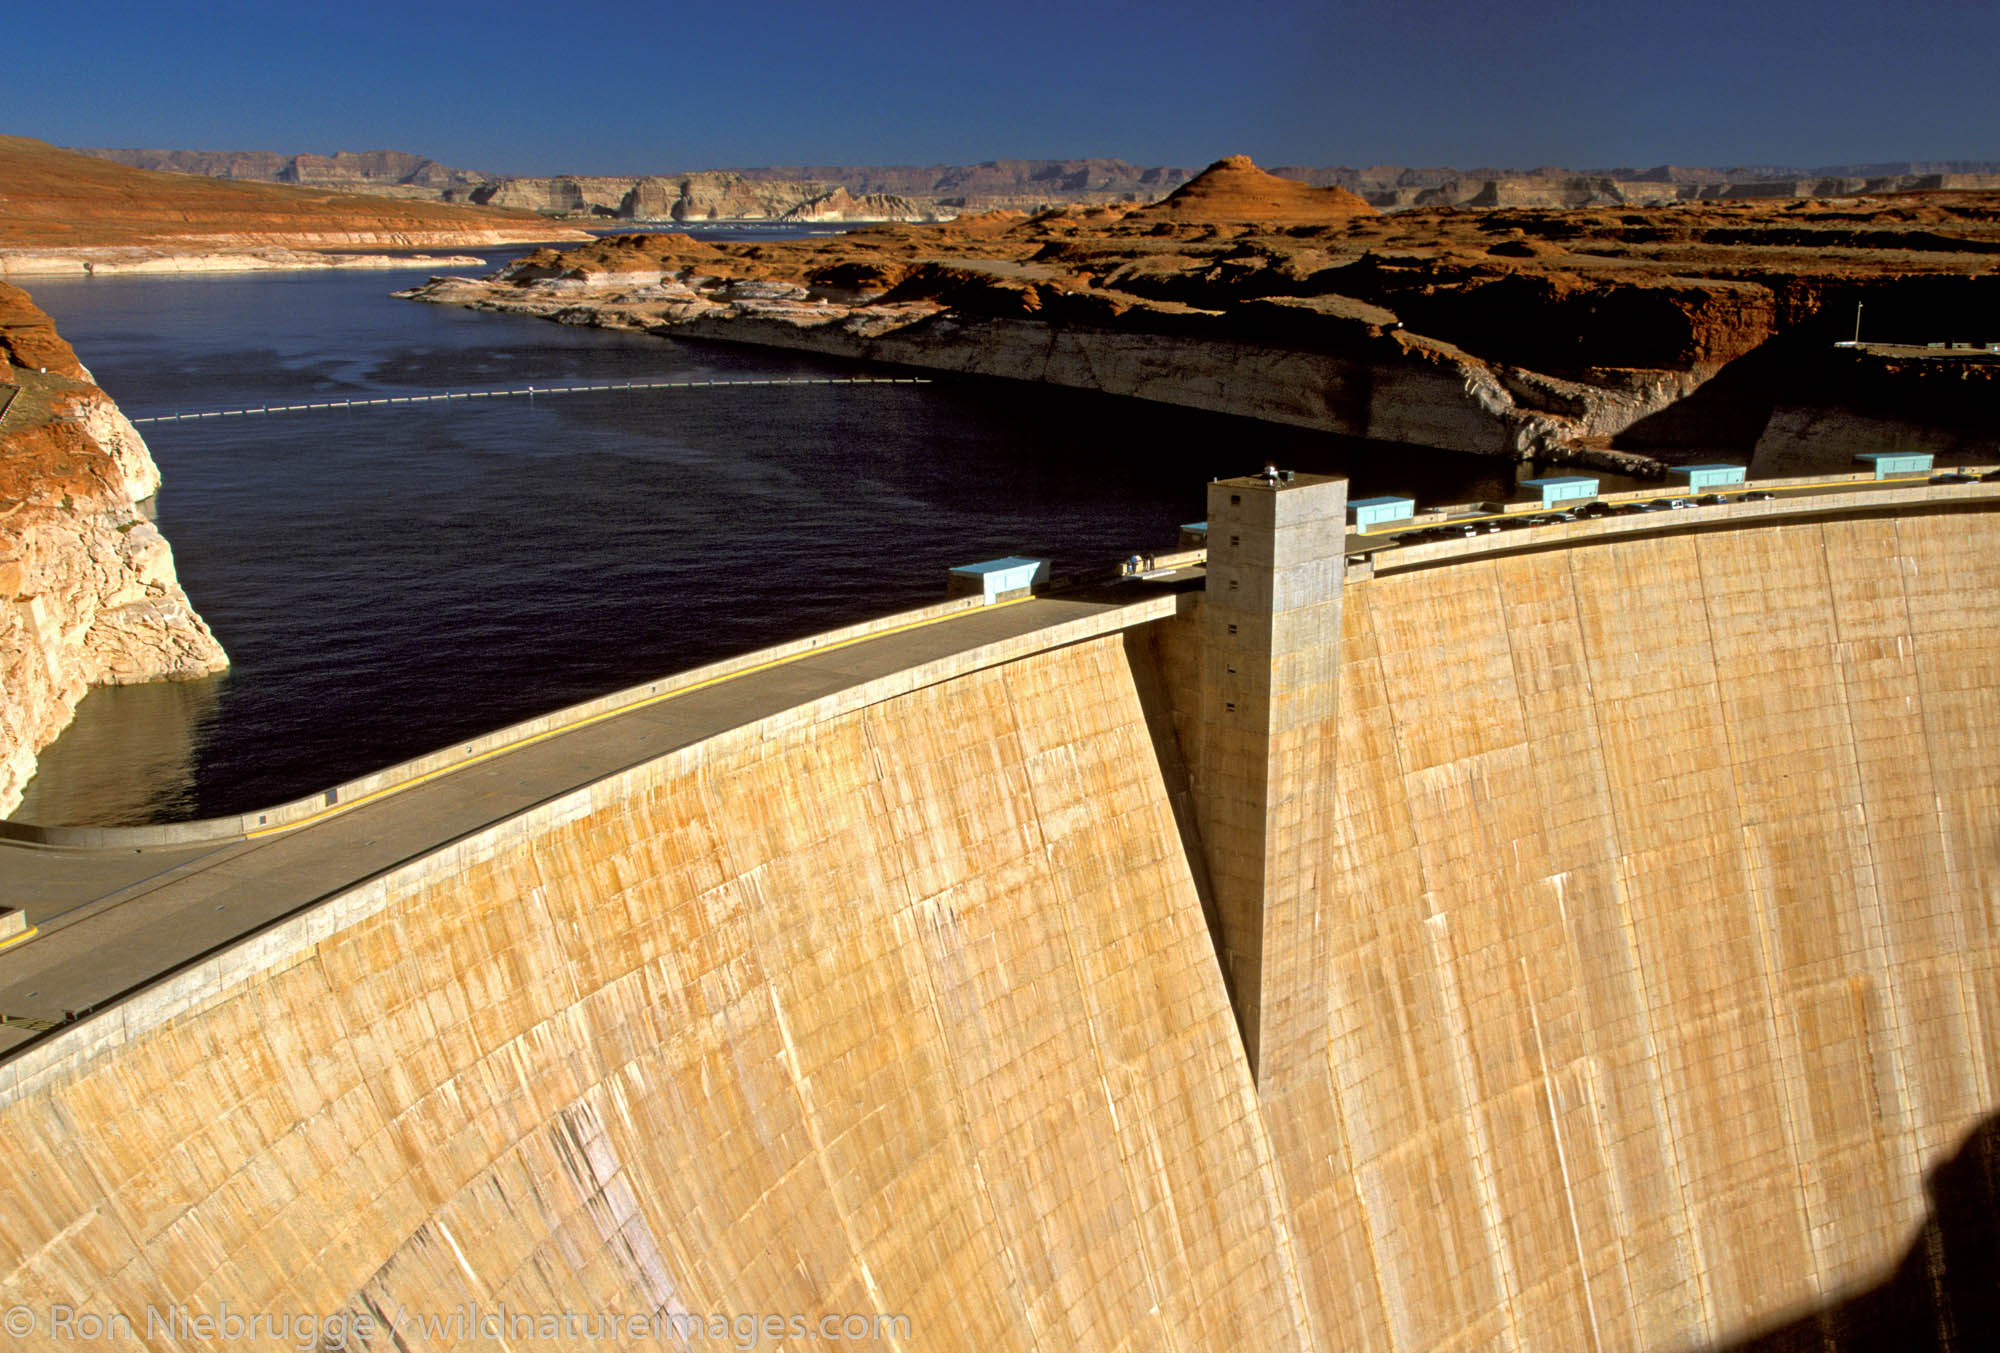 Lake Powell and the Glen Canyon Dam, Glen Canyon National Recreation Area, Page, Arizona.